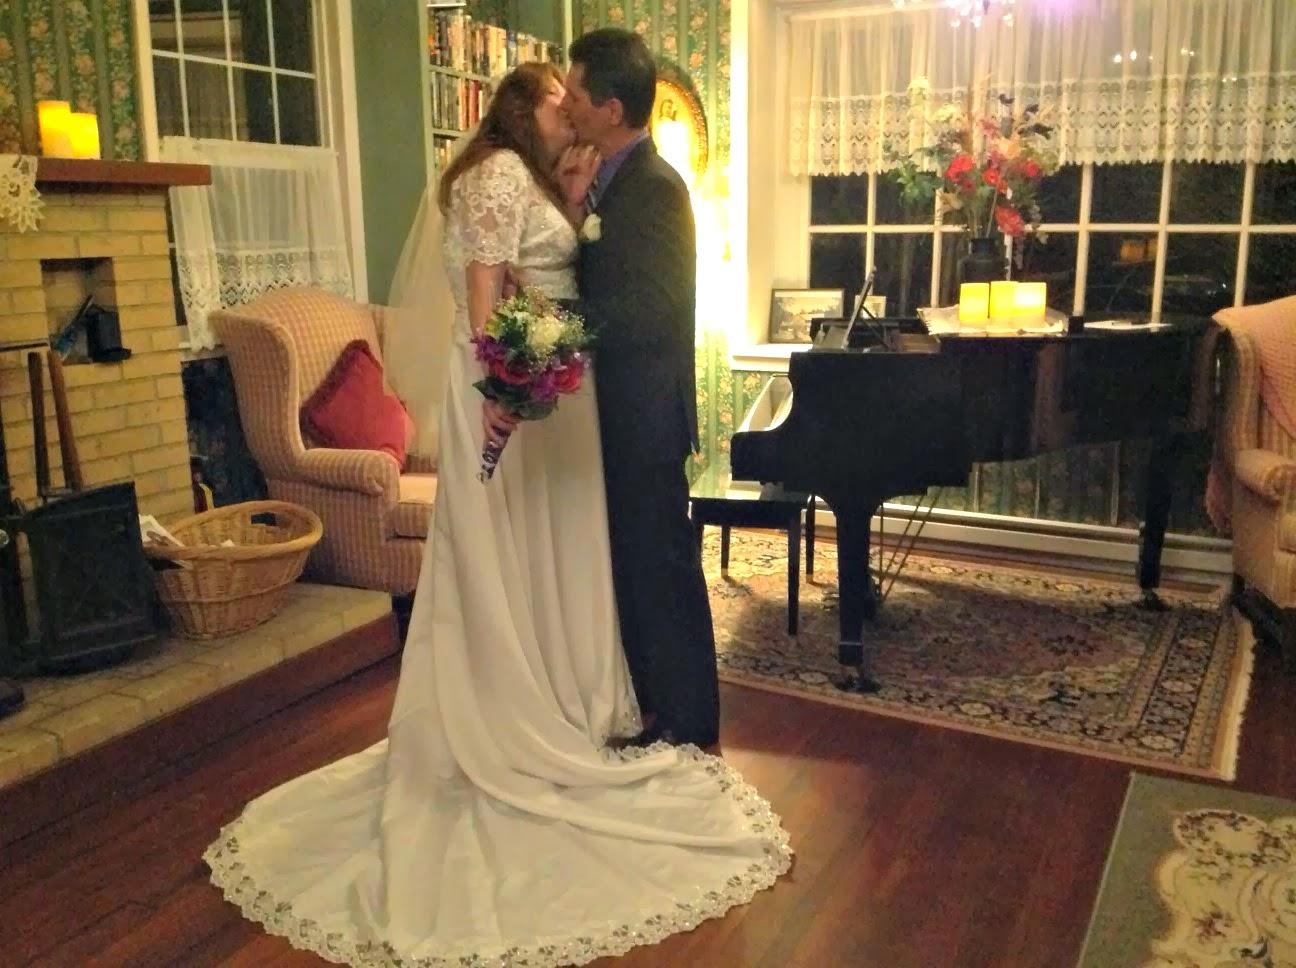 Oregon Coast Weddings and Elopements http://orcoastweddings.com